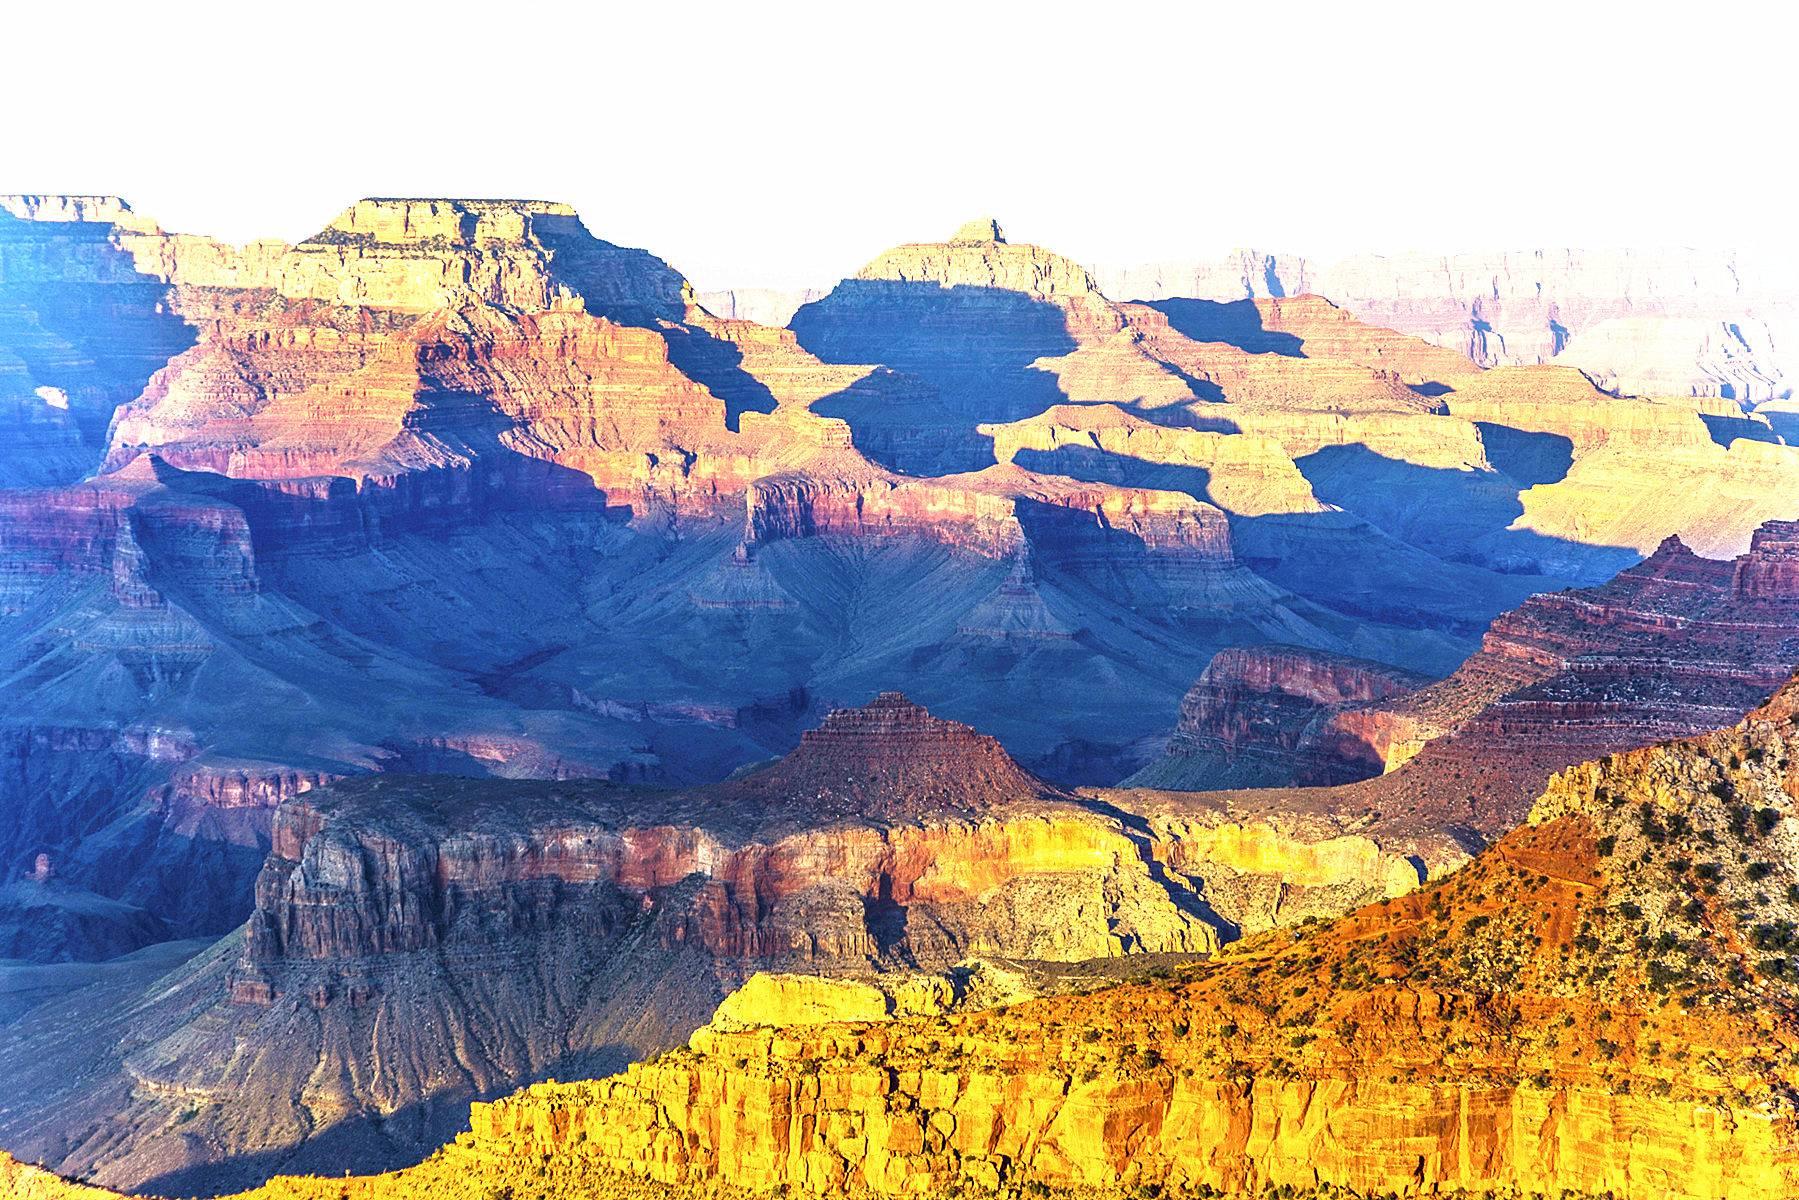 5-Day Grand Canyon, Antelope Canyon, & Las Vegas Bus Tour With Choice of Californian Theme Parks